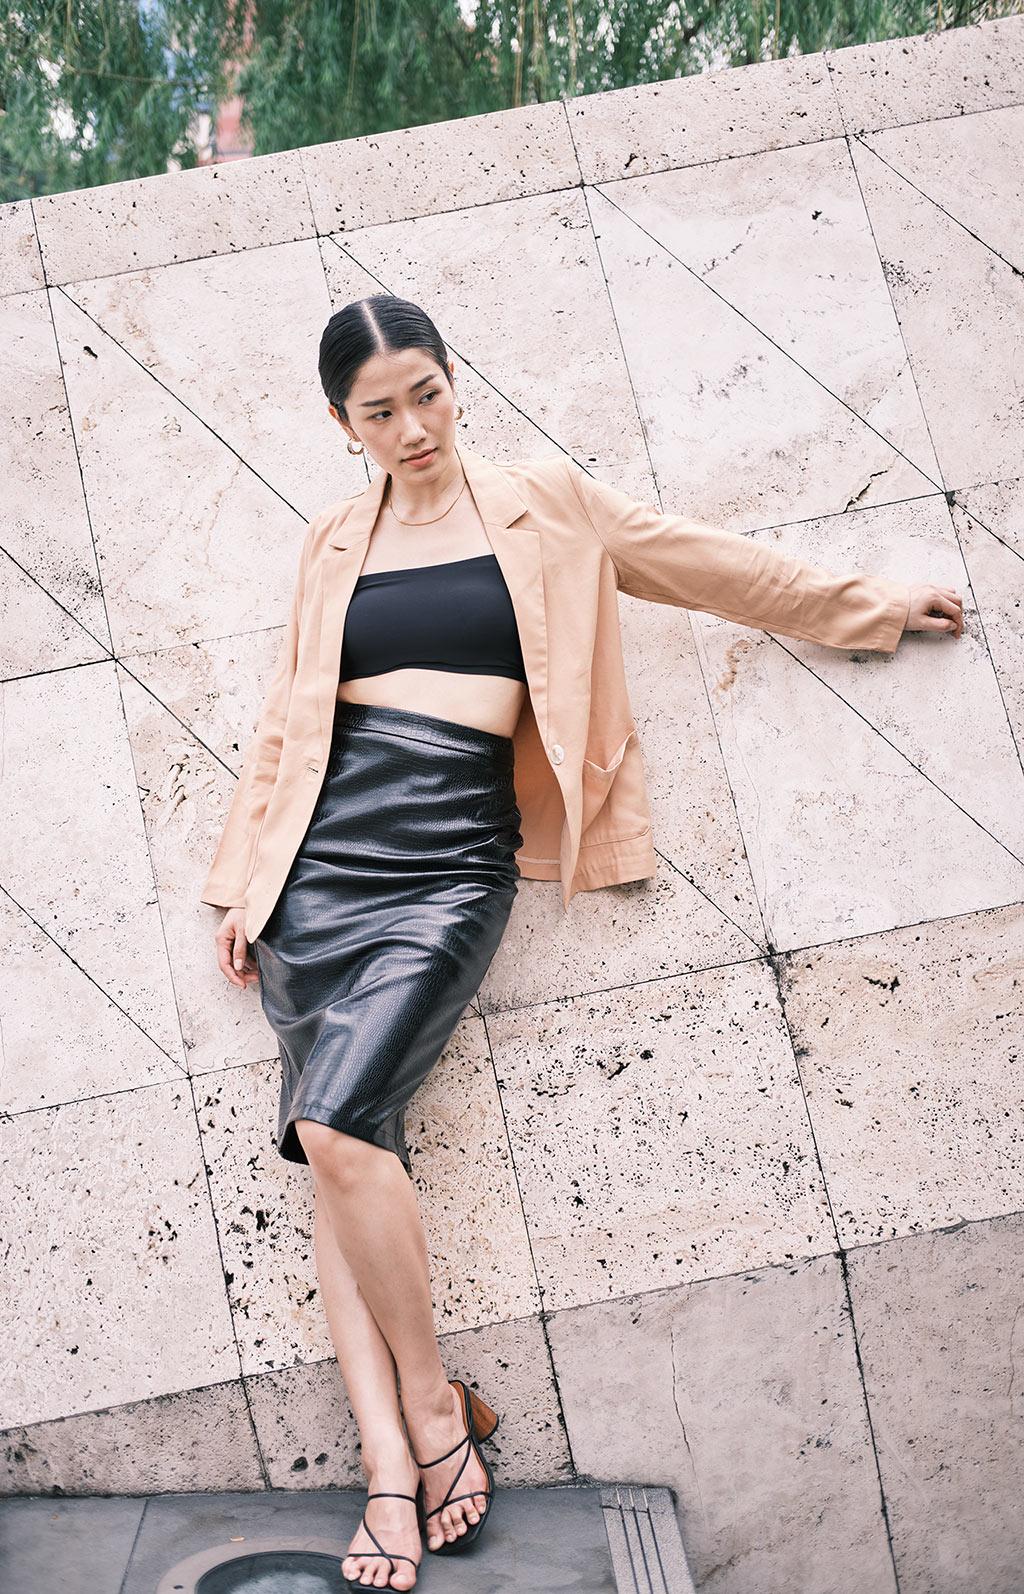 Urban Chic Fashion Film Recipe Fuji X-T4